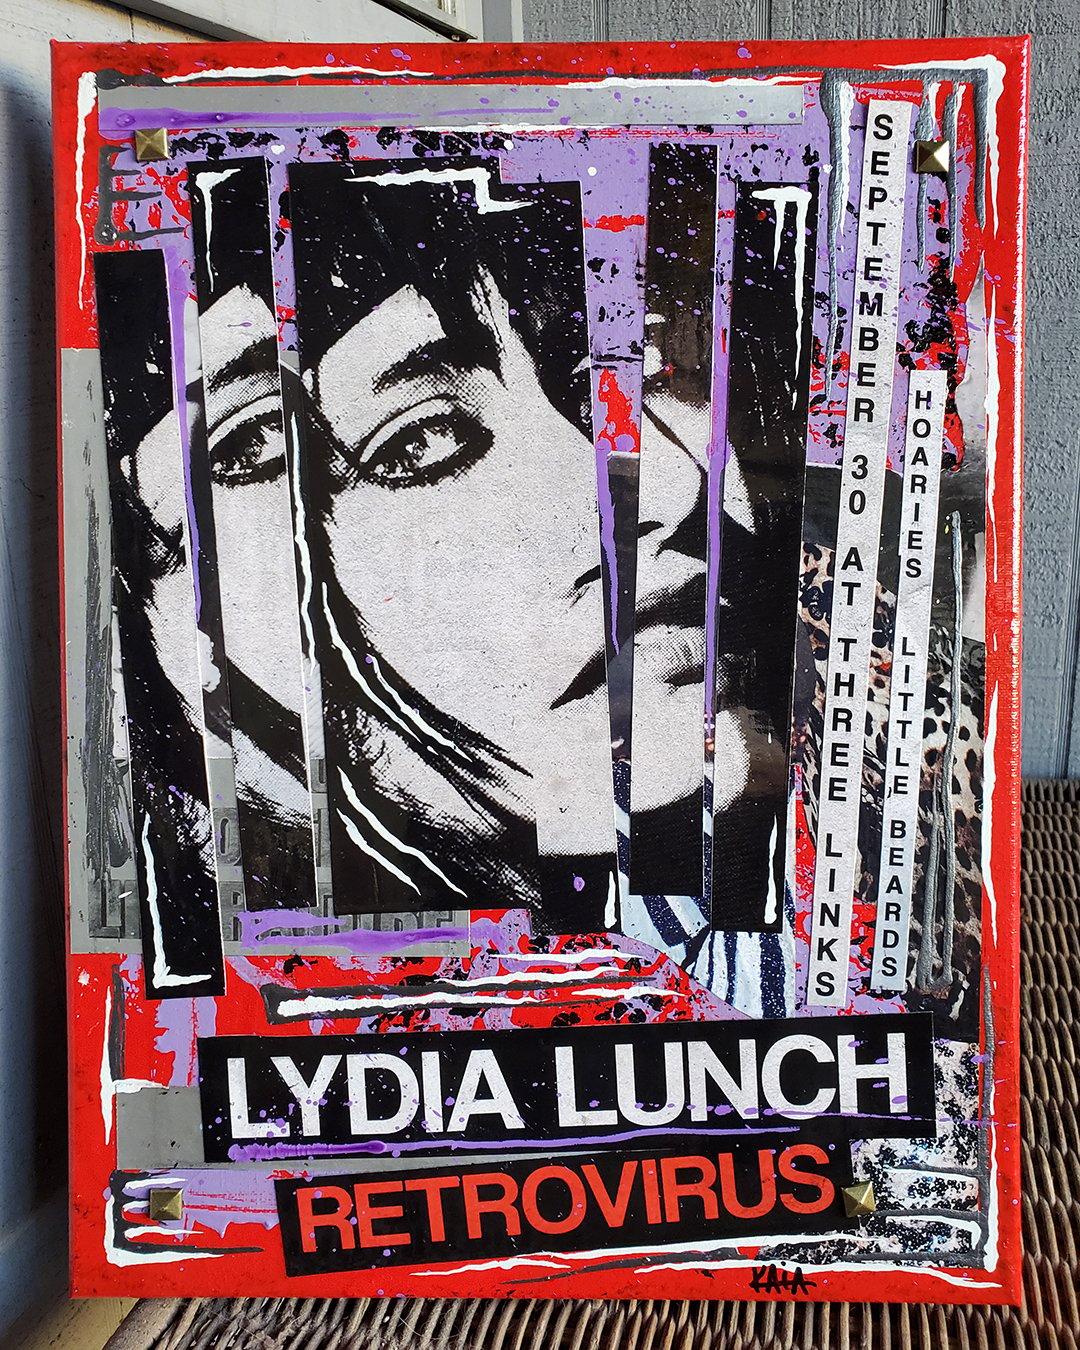 Lydia Lunch Retrovirus (12x16 canvas)